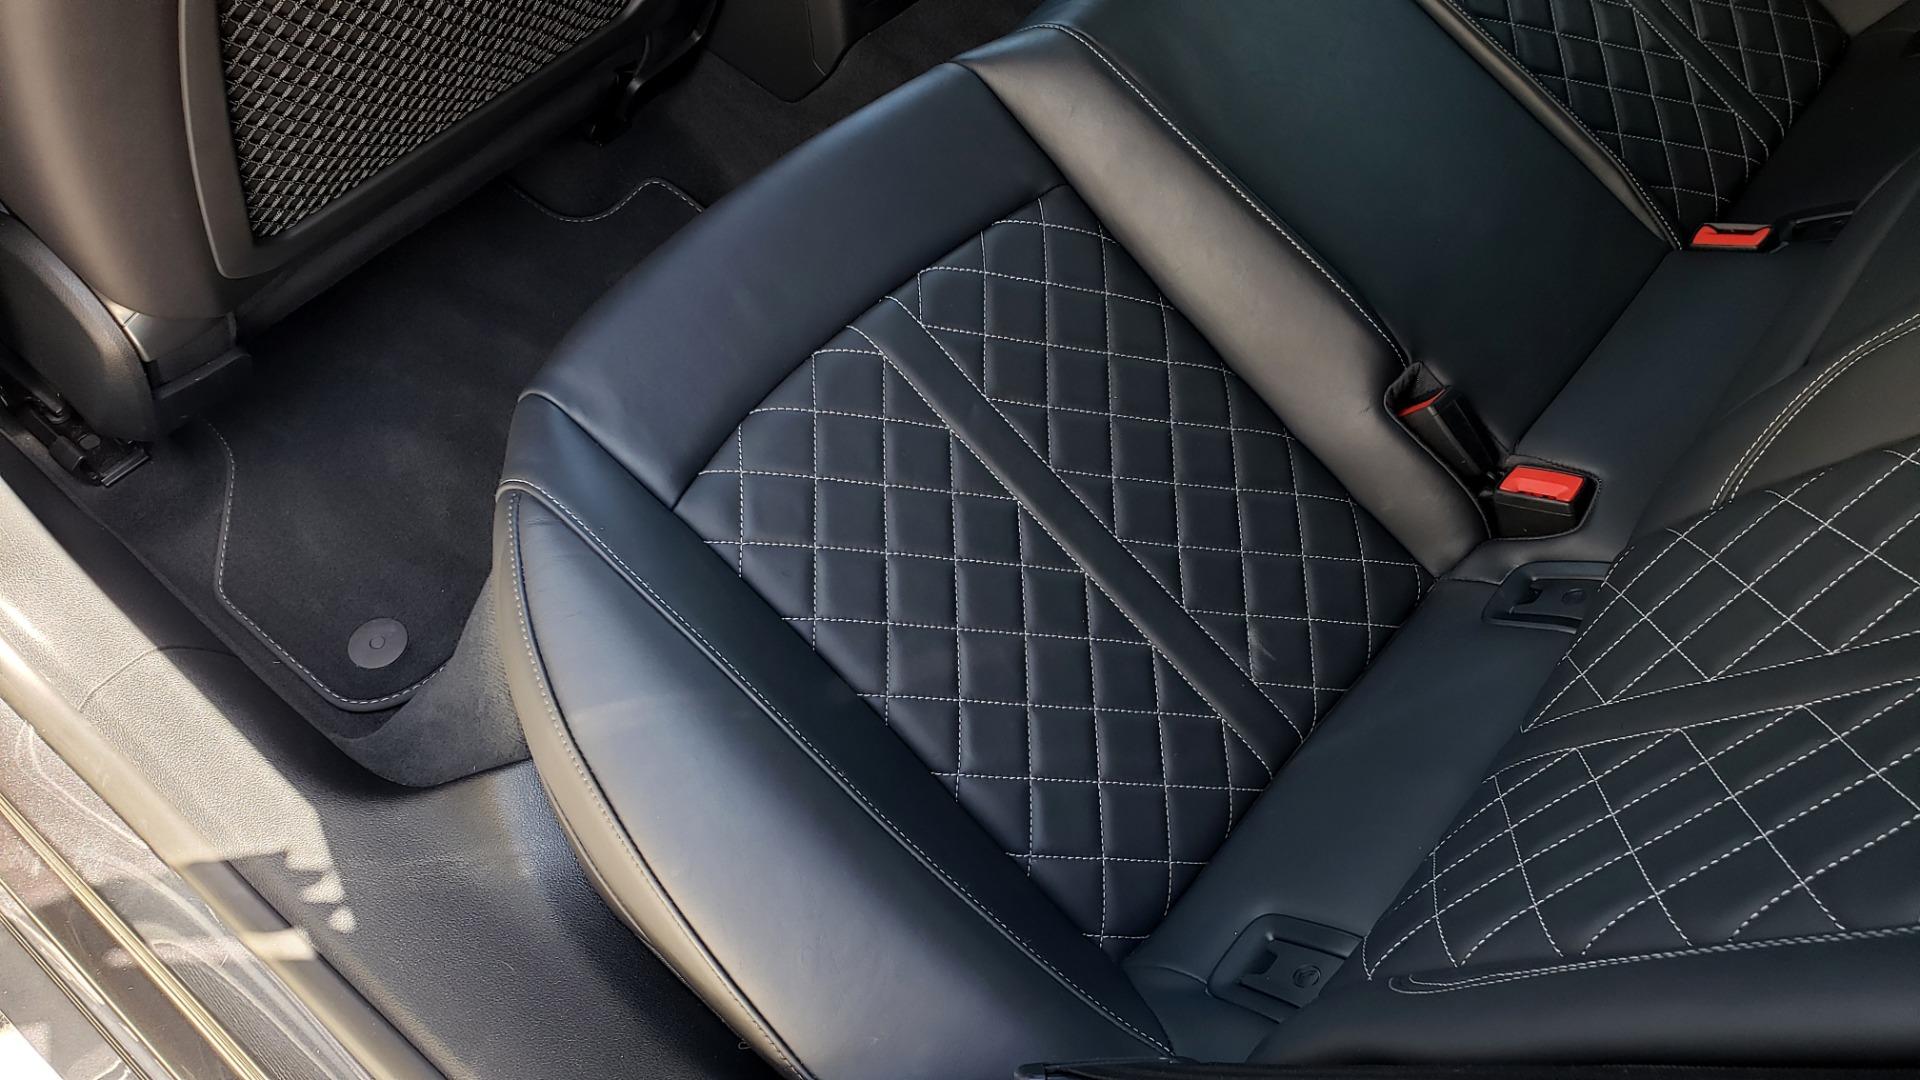 Used 2018 Audi S5 SPORTBACK PRESTIGE S-SPORT / NAV / SUNROOF / HUD / B&O SND / REARVIEW for sale $48,995 at Formula Imports in Charlotte NC 28227 51